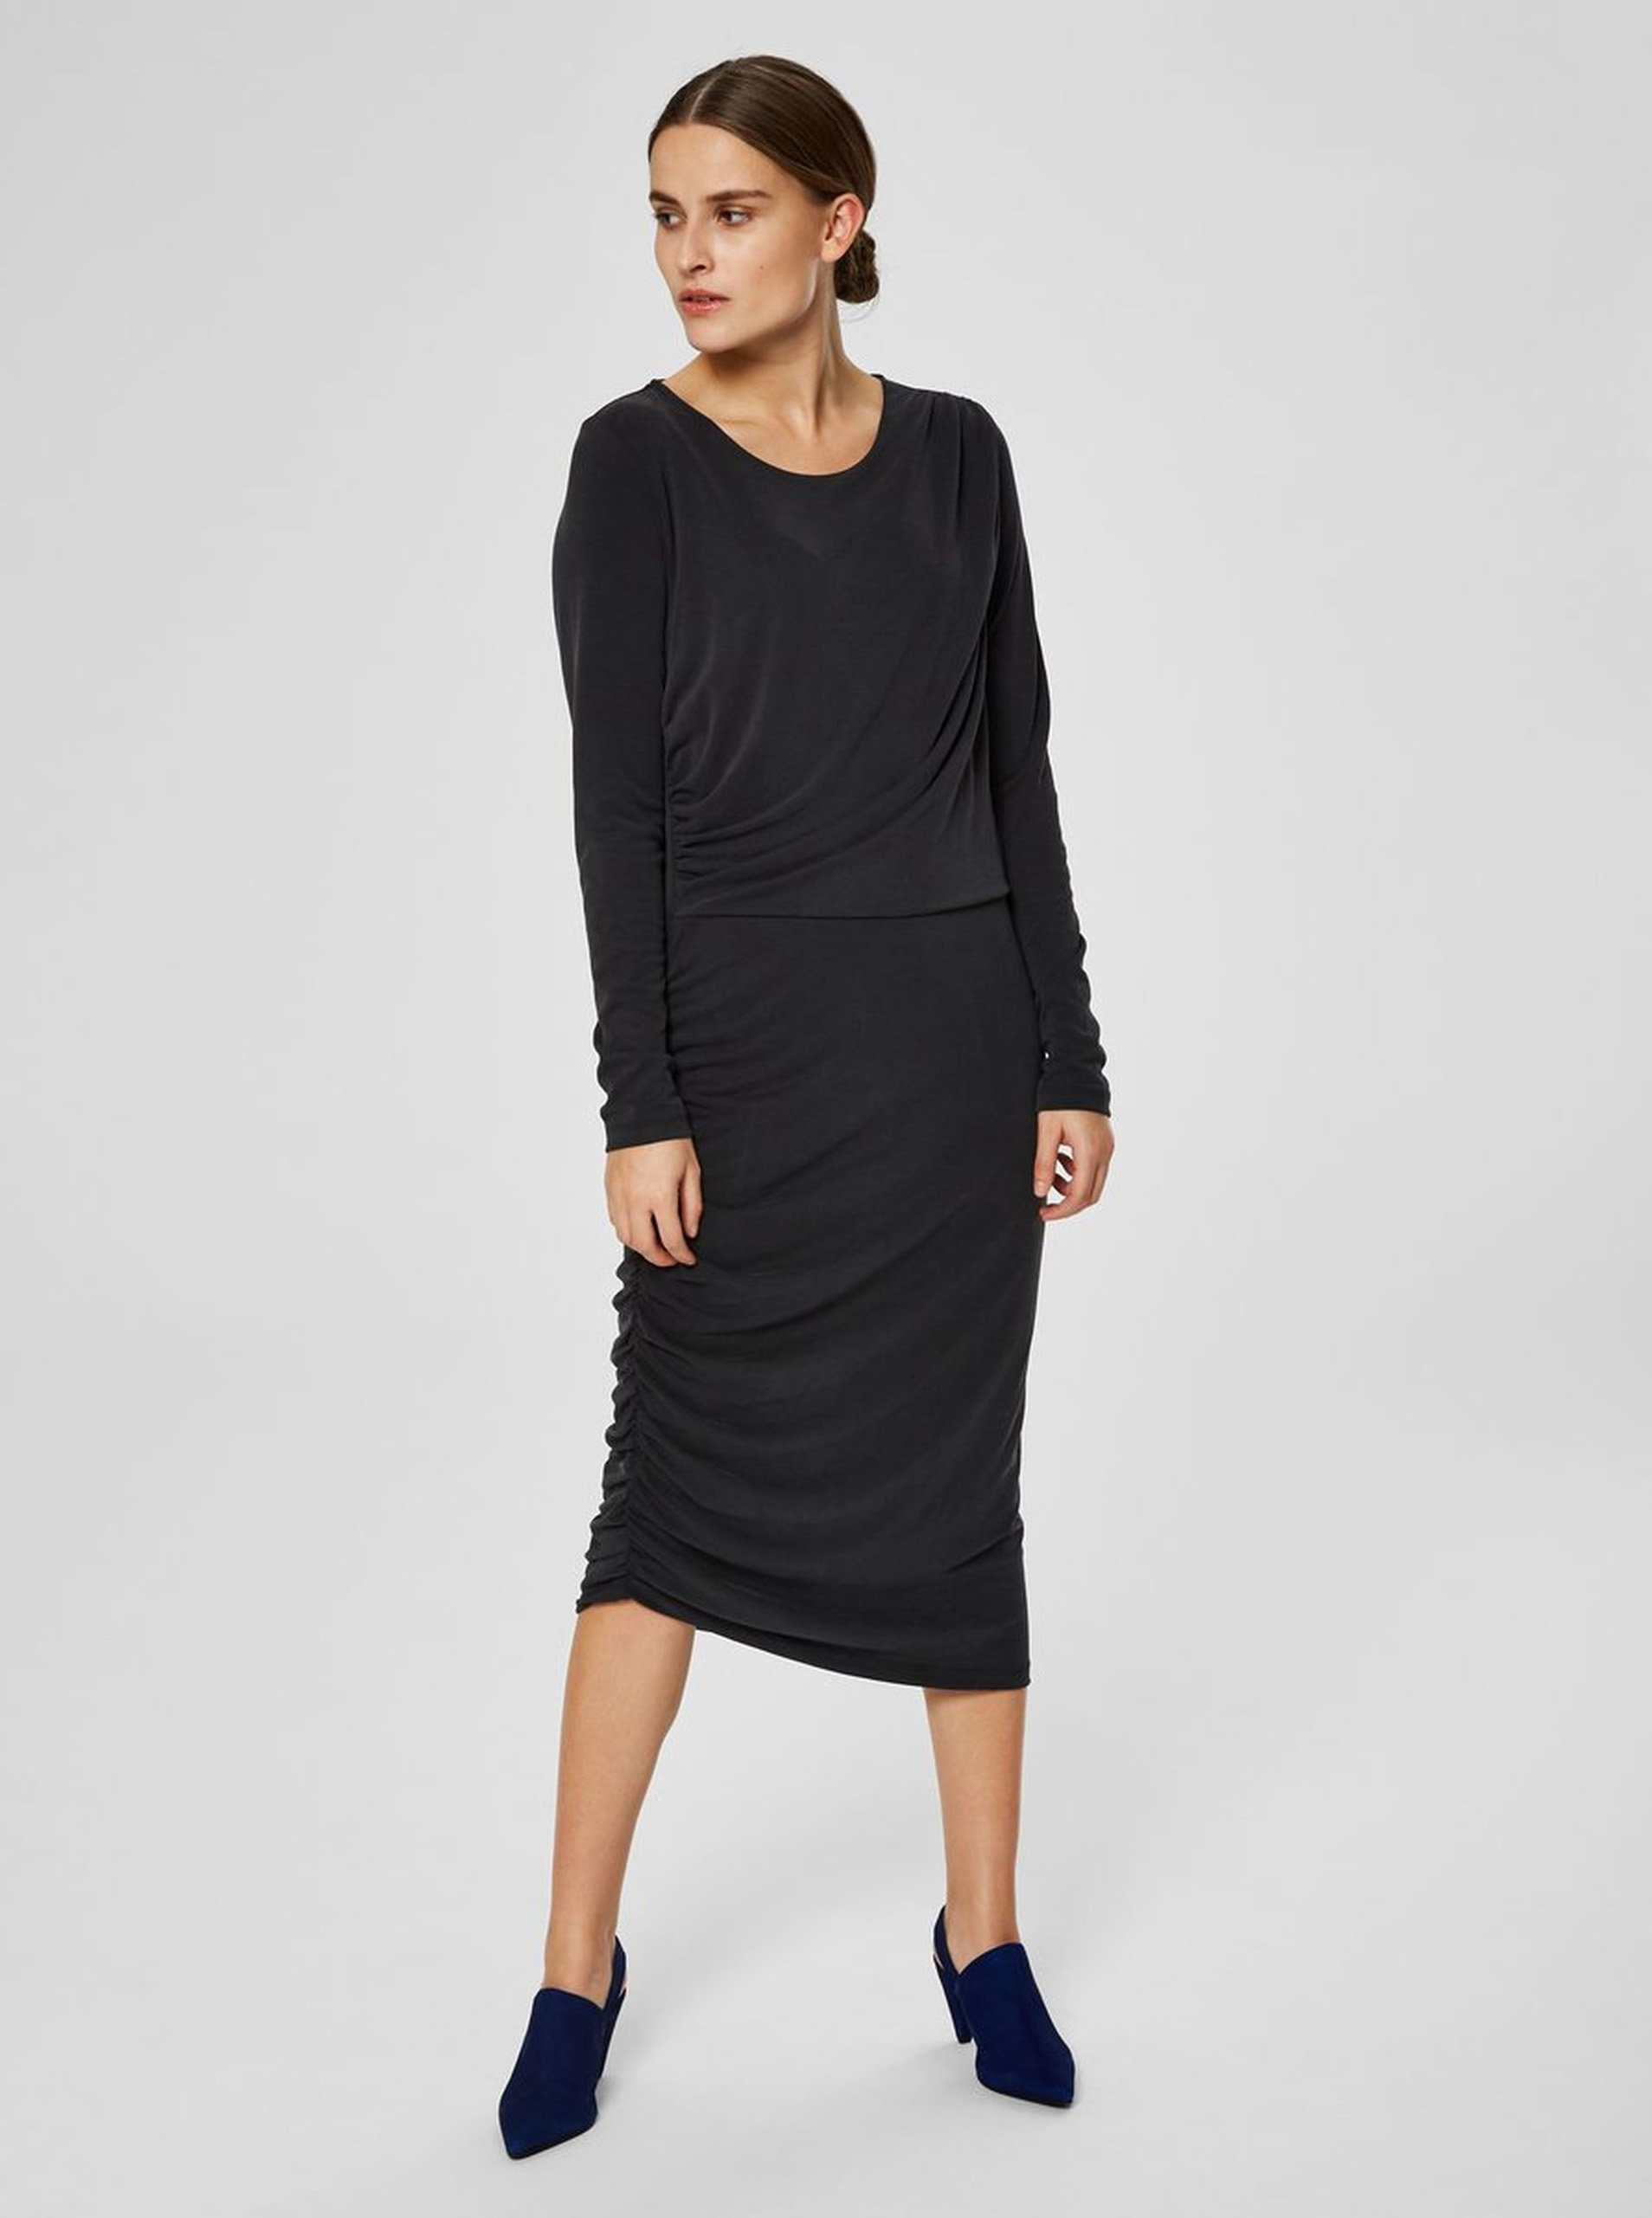 7de491ab978e Čierne asymetrické šaty s riasením na boku Selected Femme Helen ...